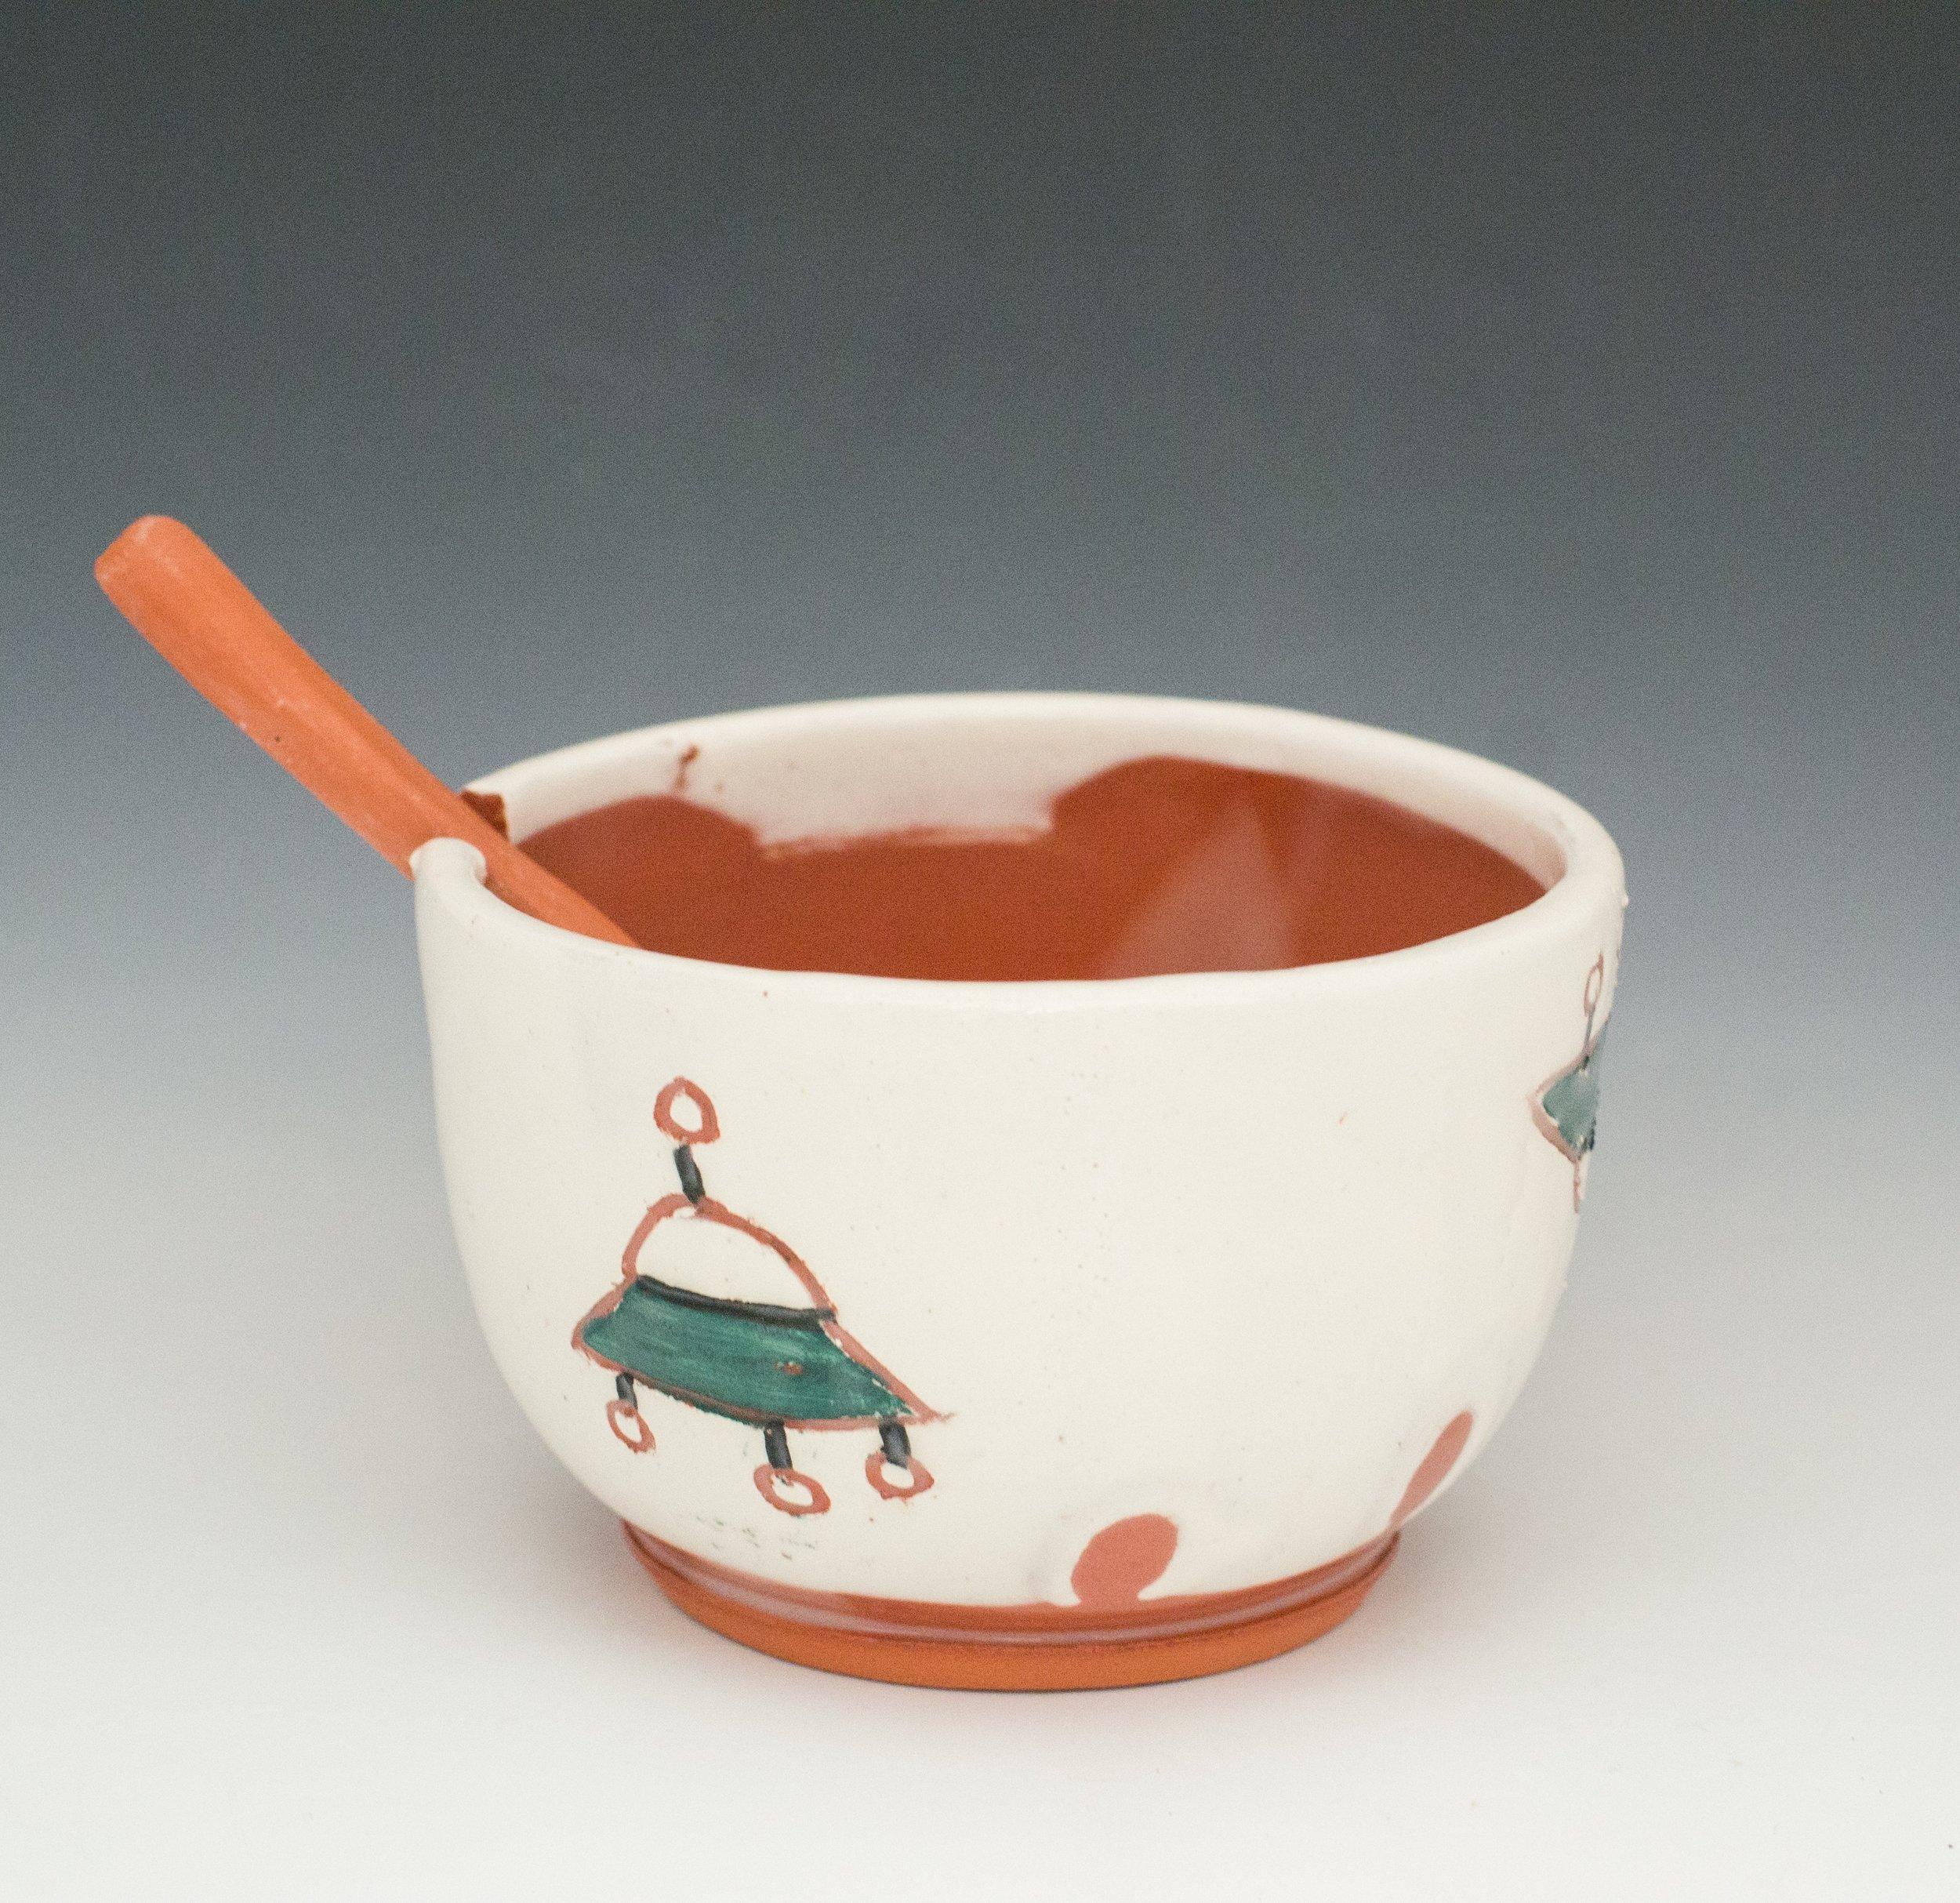 Spaceship sugar bowl with spoon